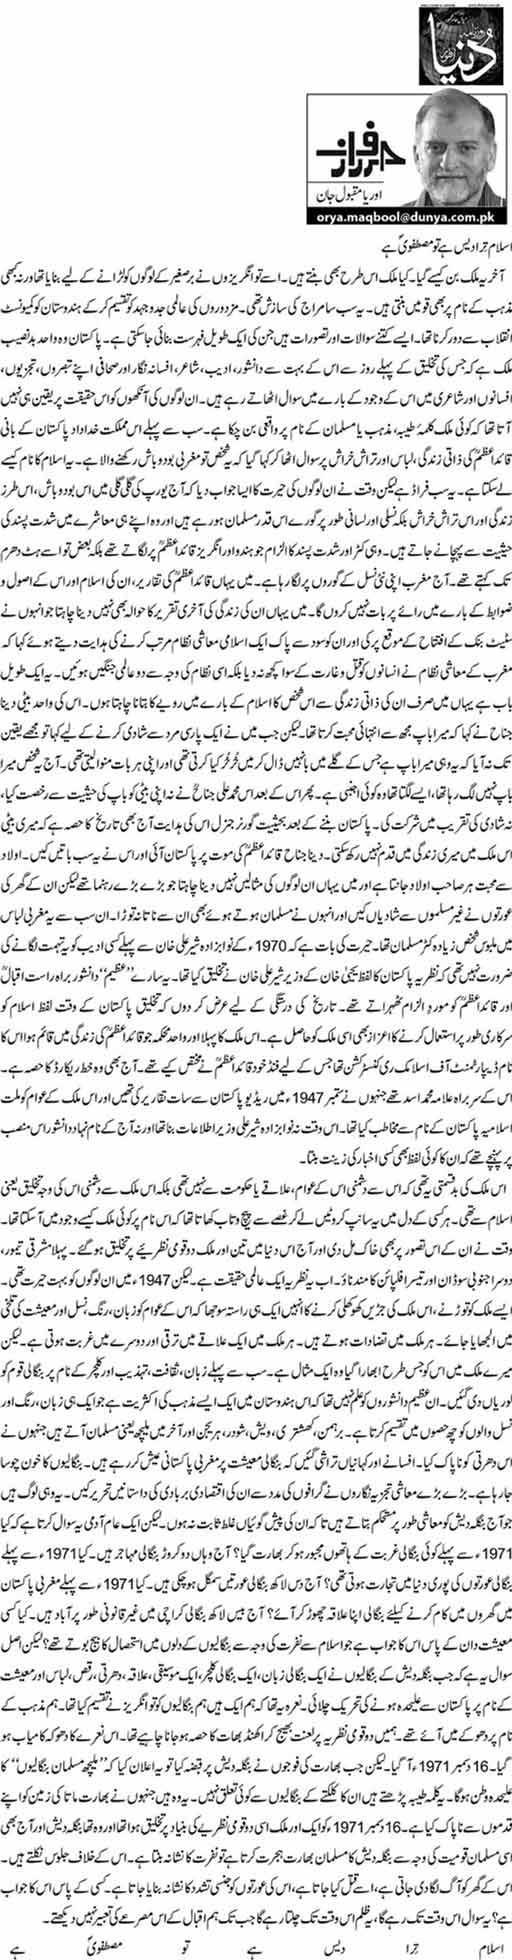 Islam tera dais hai to Mutafvi hai - Orya Maqbool Jan